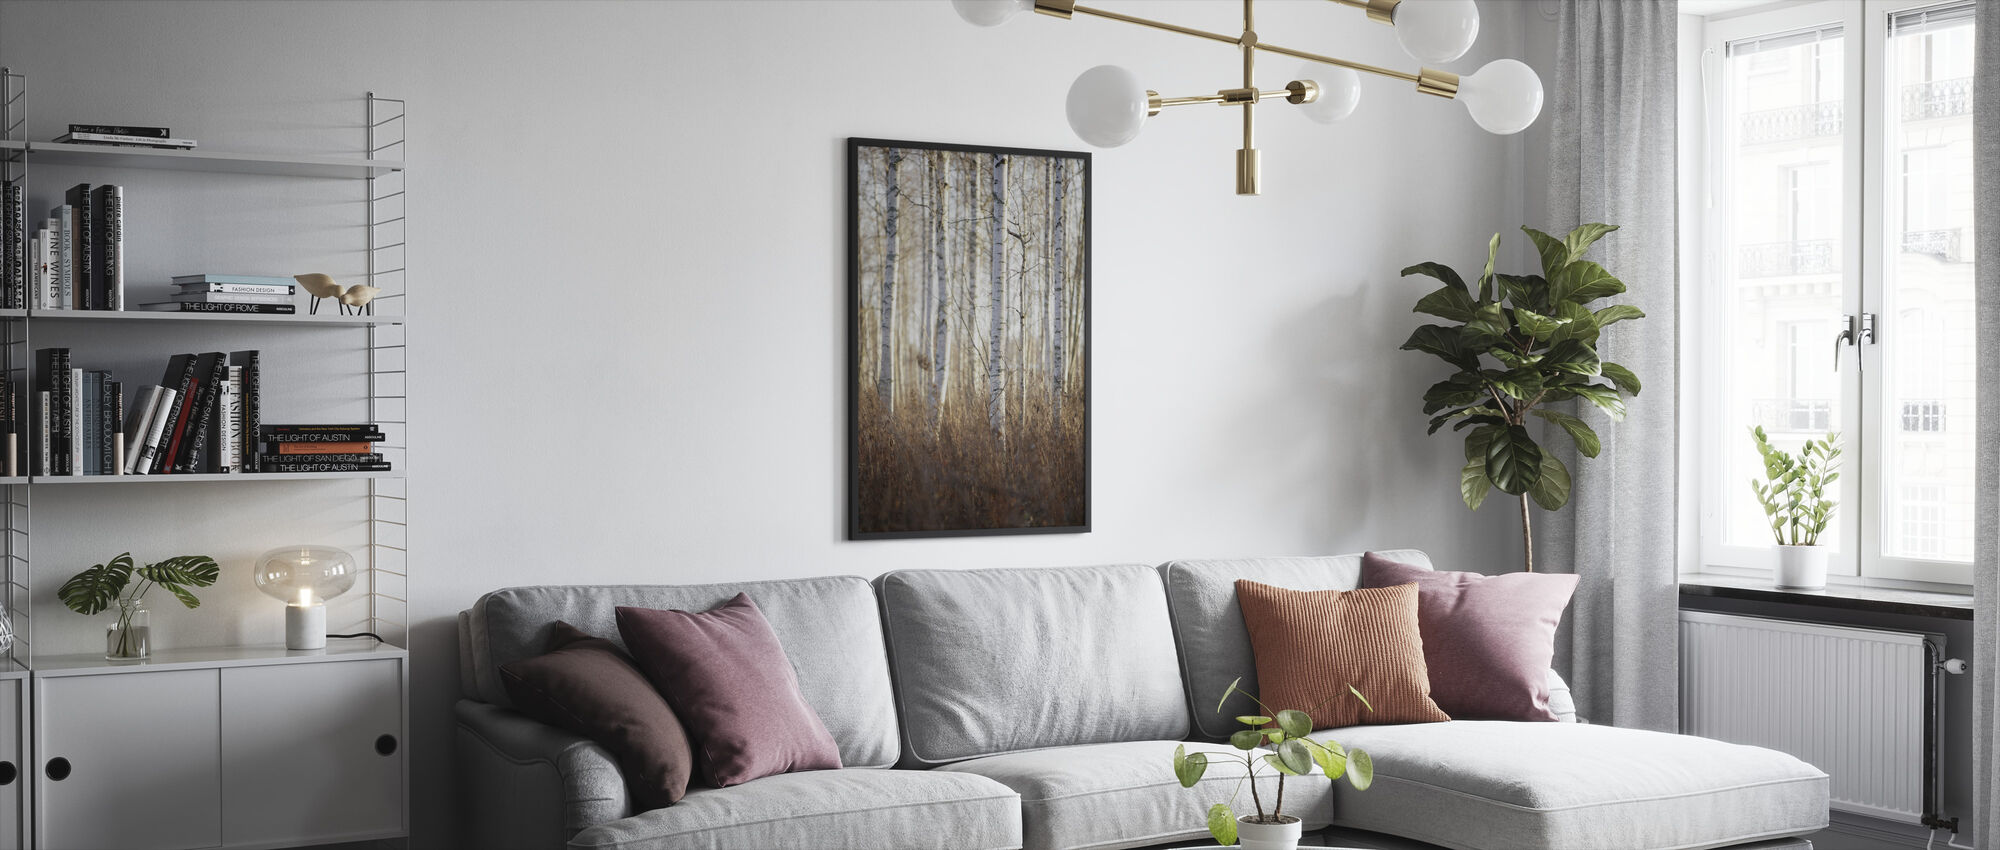 Birch Forest in Dalarna, Sweden, Europe - Framed print - Living Room